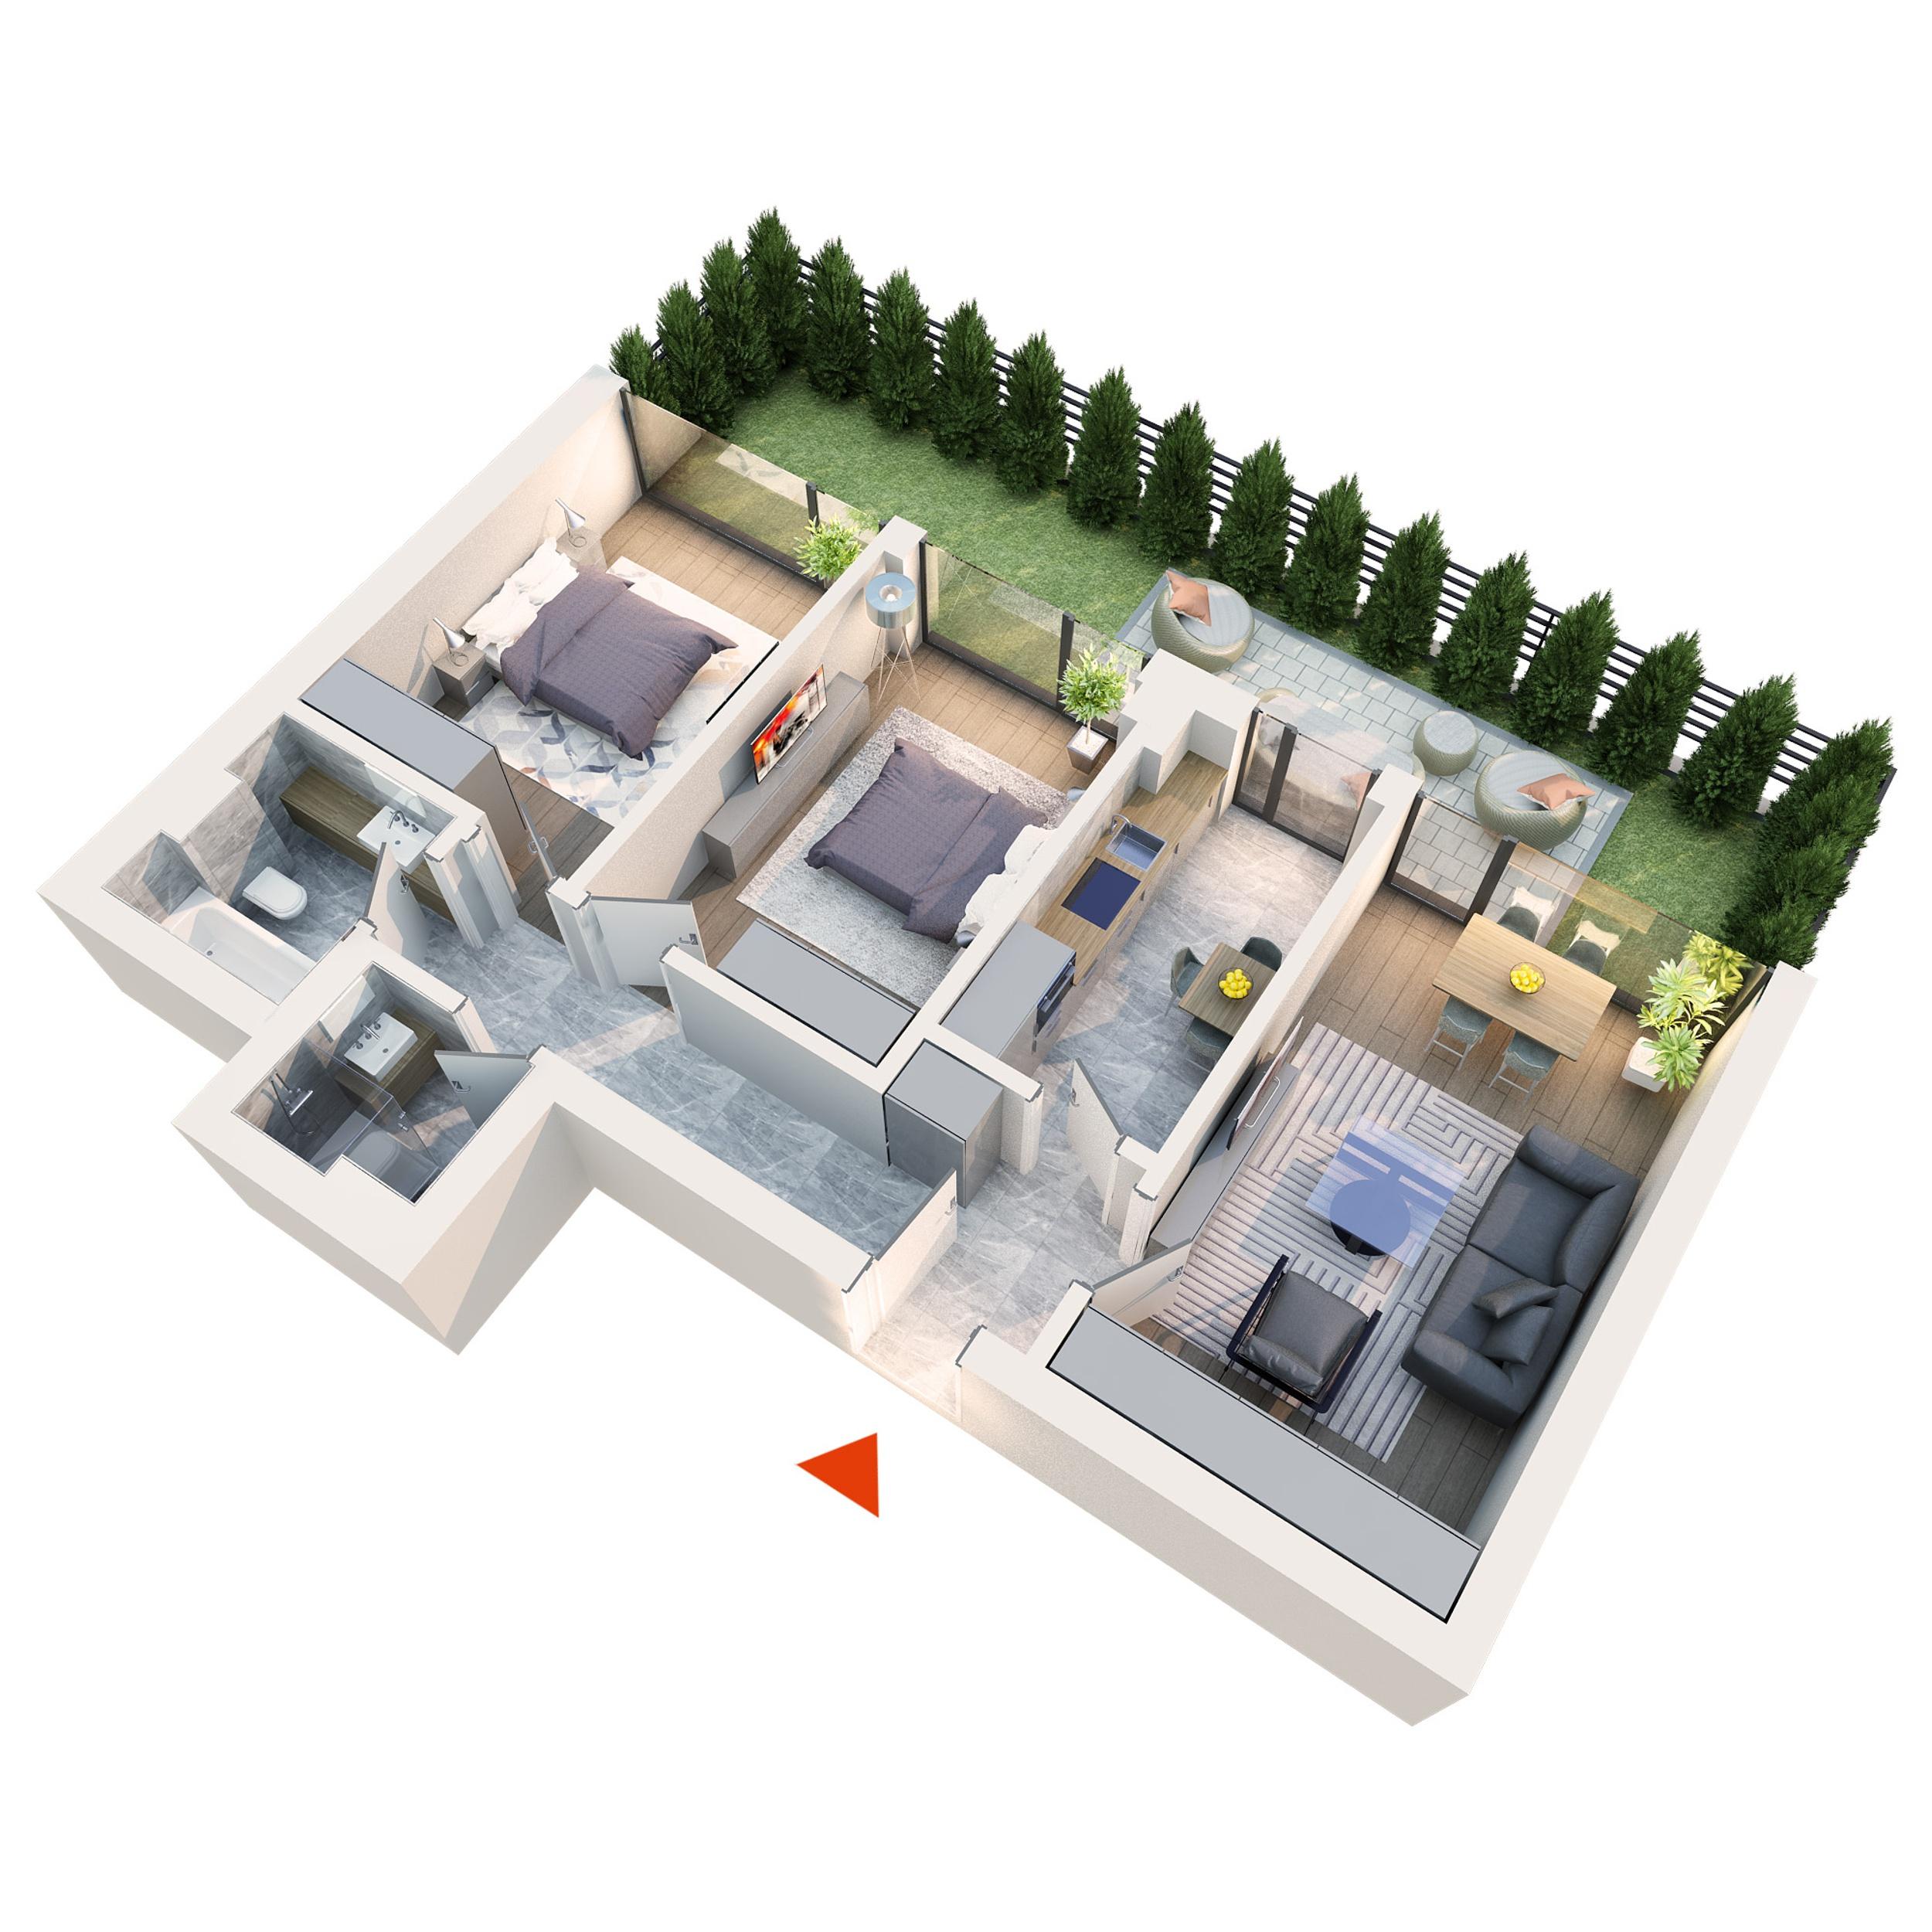 Apartament 3 camere tip 3A3 gradina | Parter | Corp C2 C5 | Faza 2